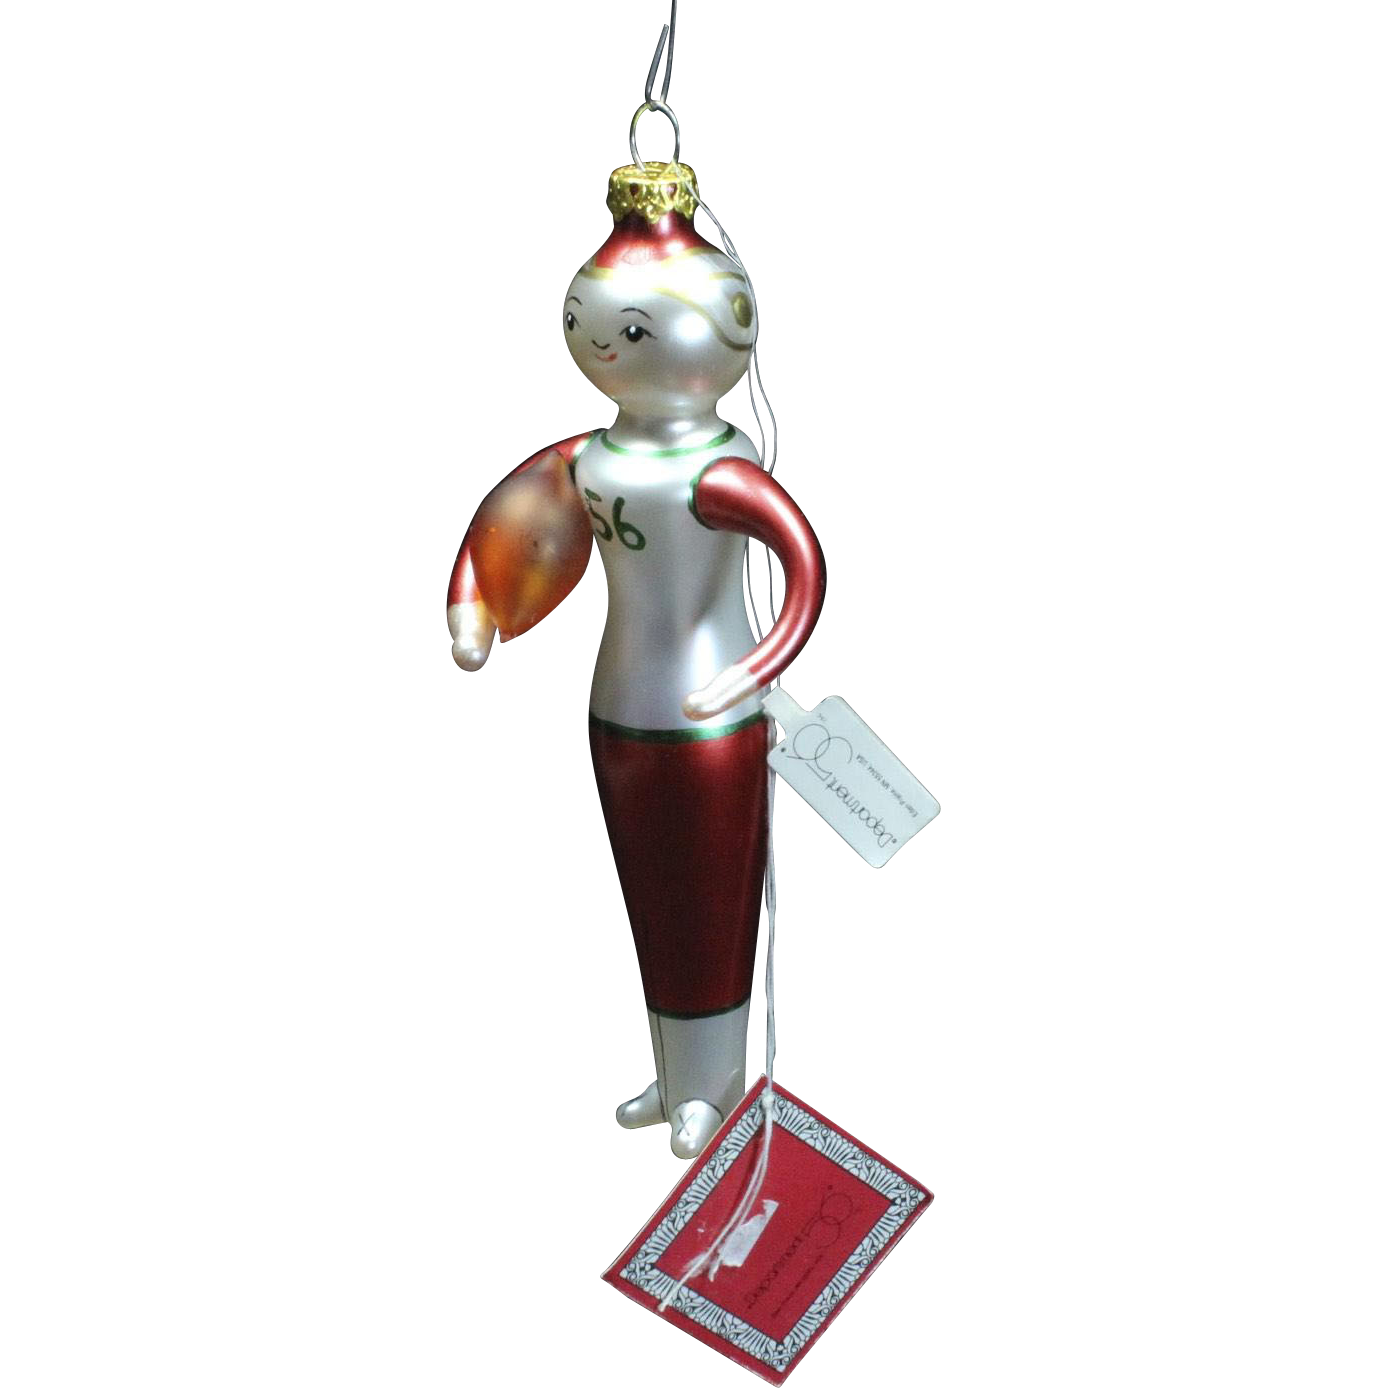 Football player ornament - Beaux Arts Department 56 Football Player Glass Christmas Ornament With Tags